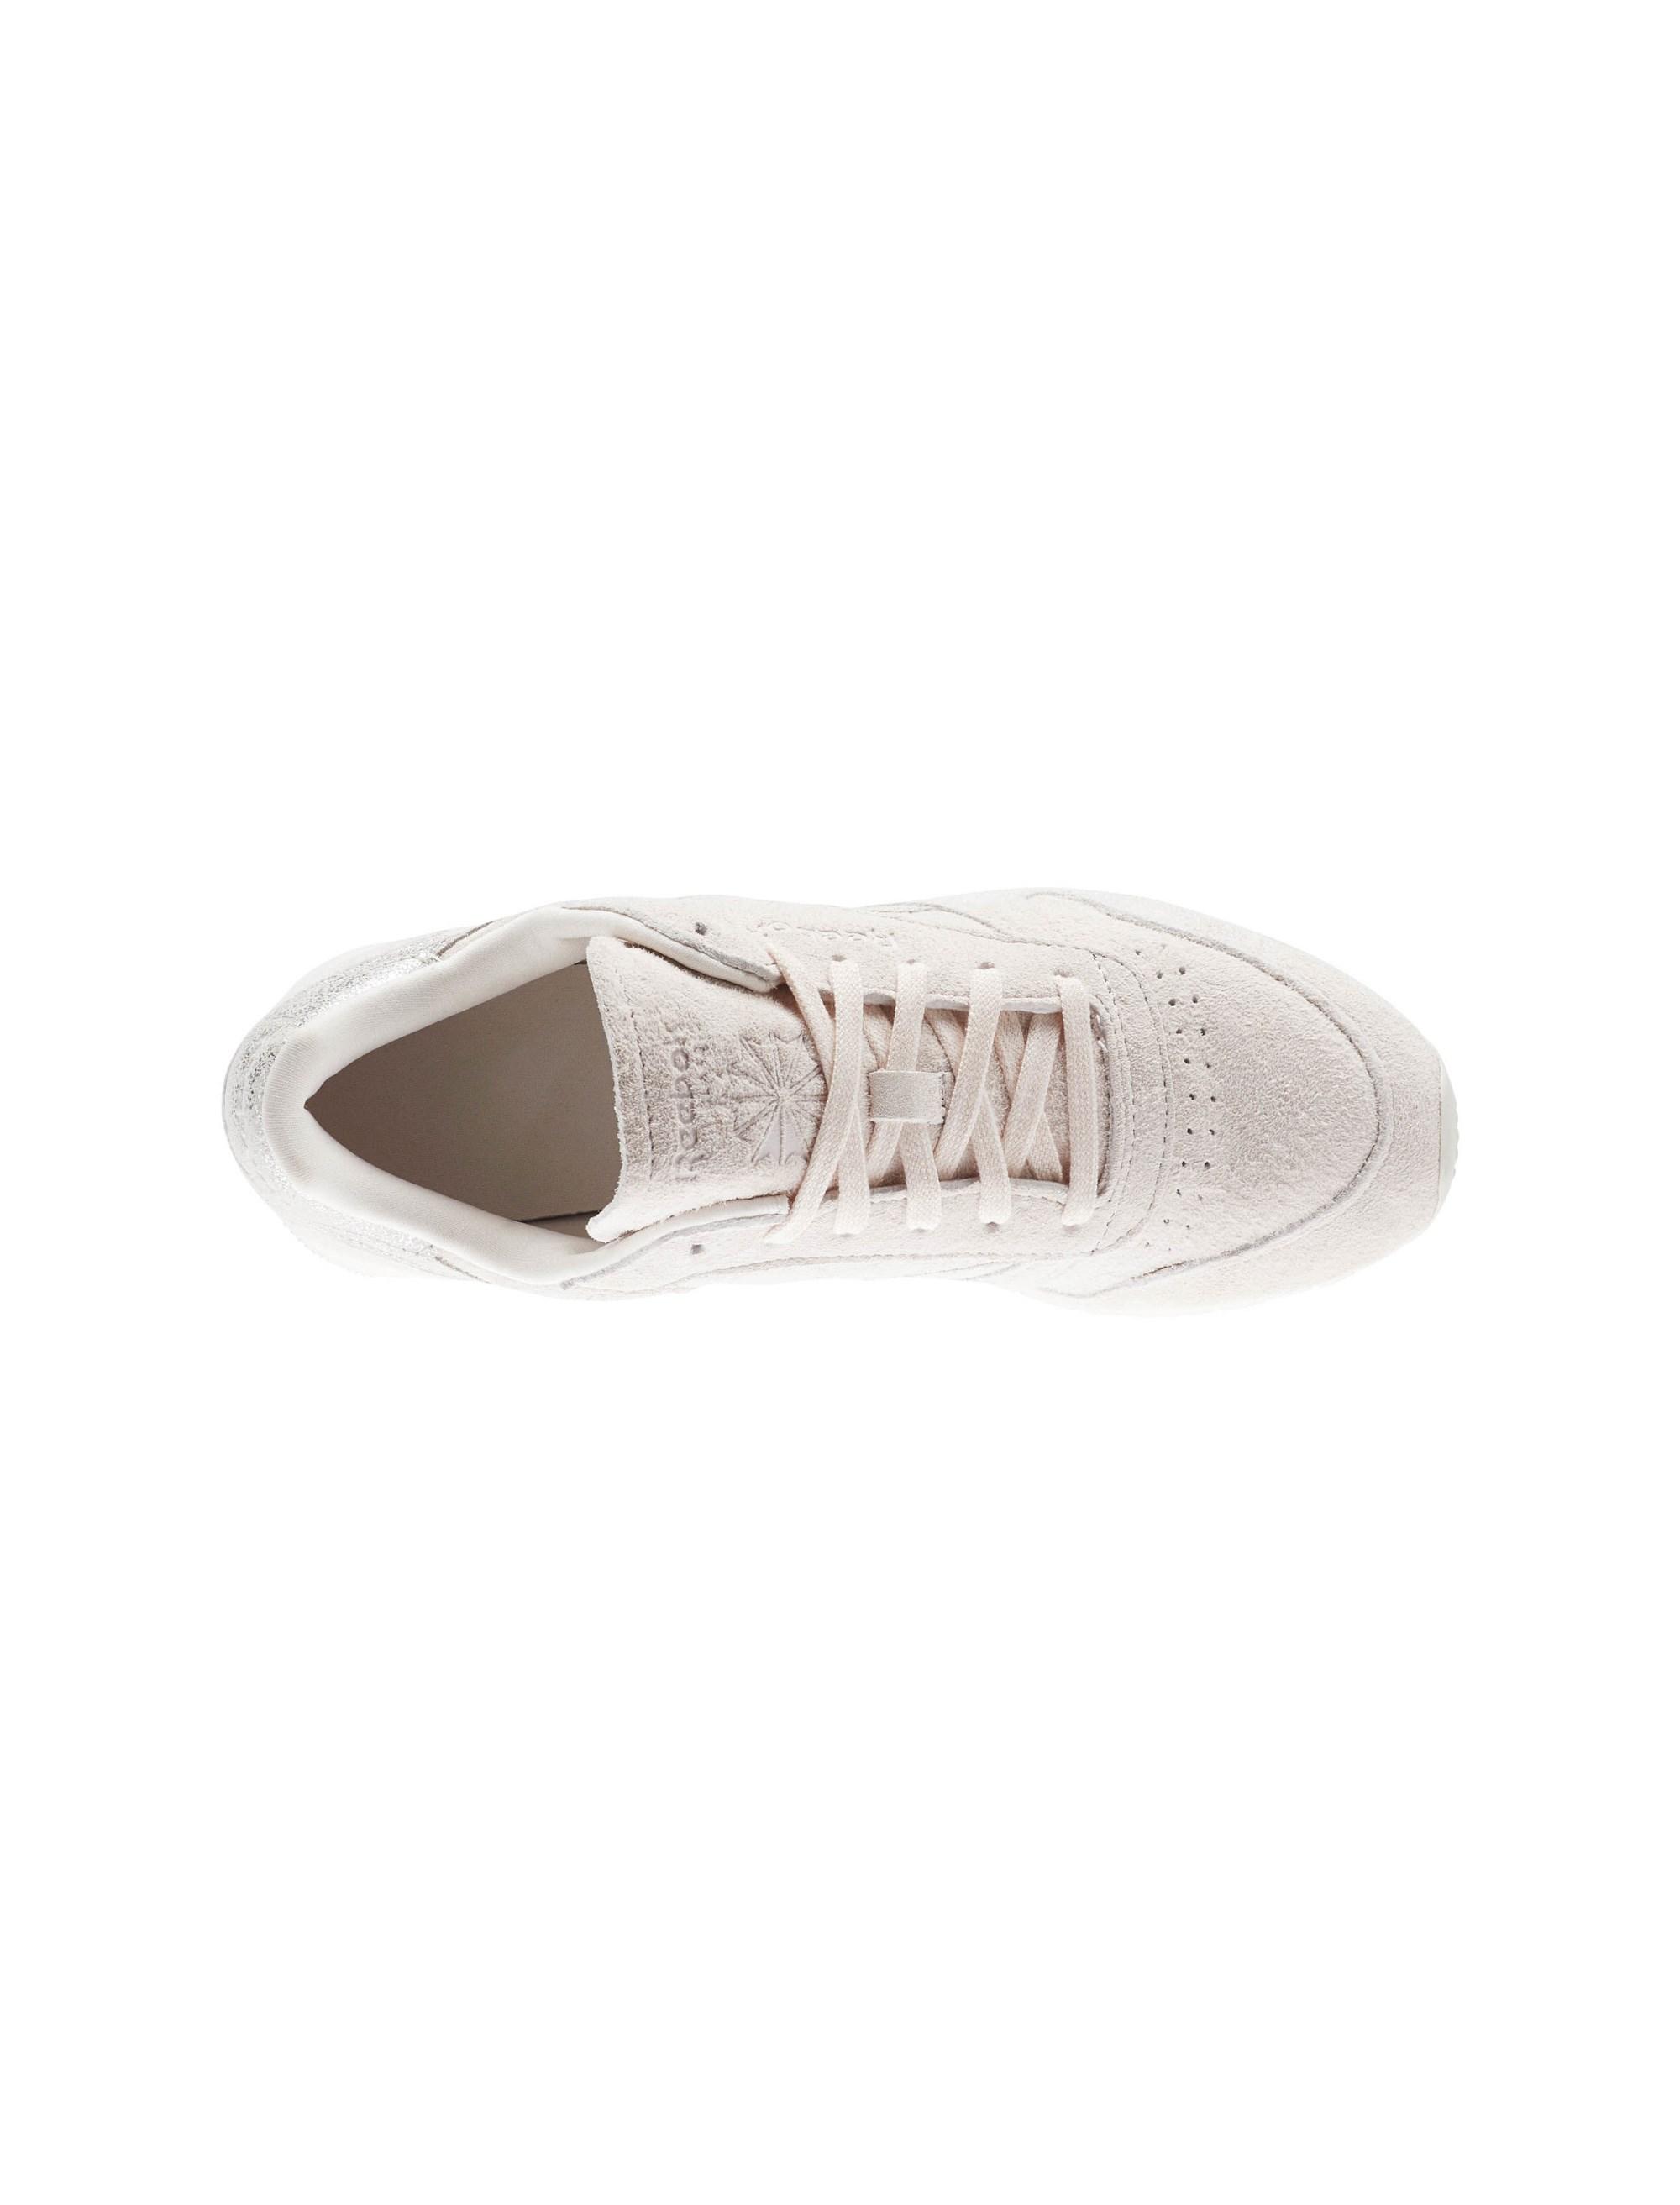 کفش زنانه ریباک مدل Classic Leather Shimmer